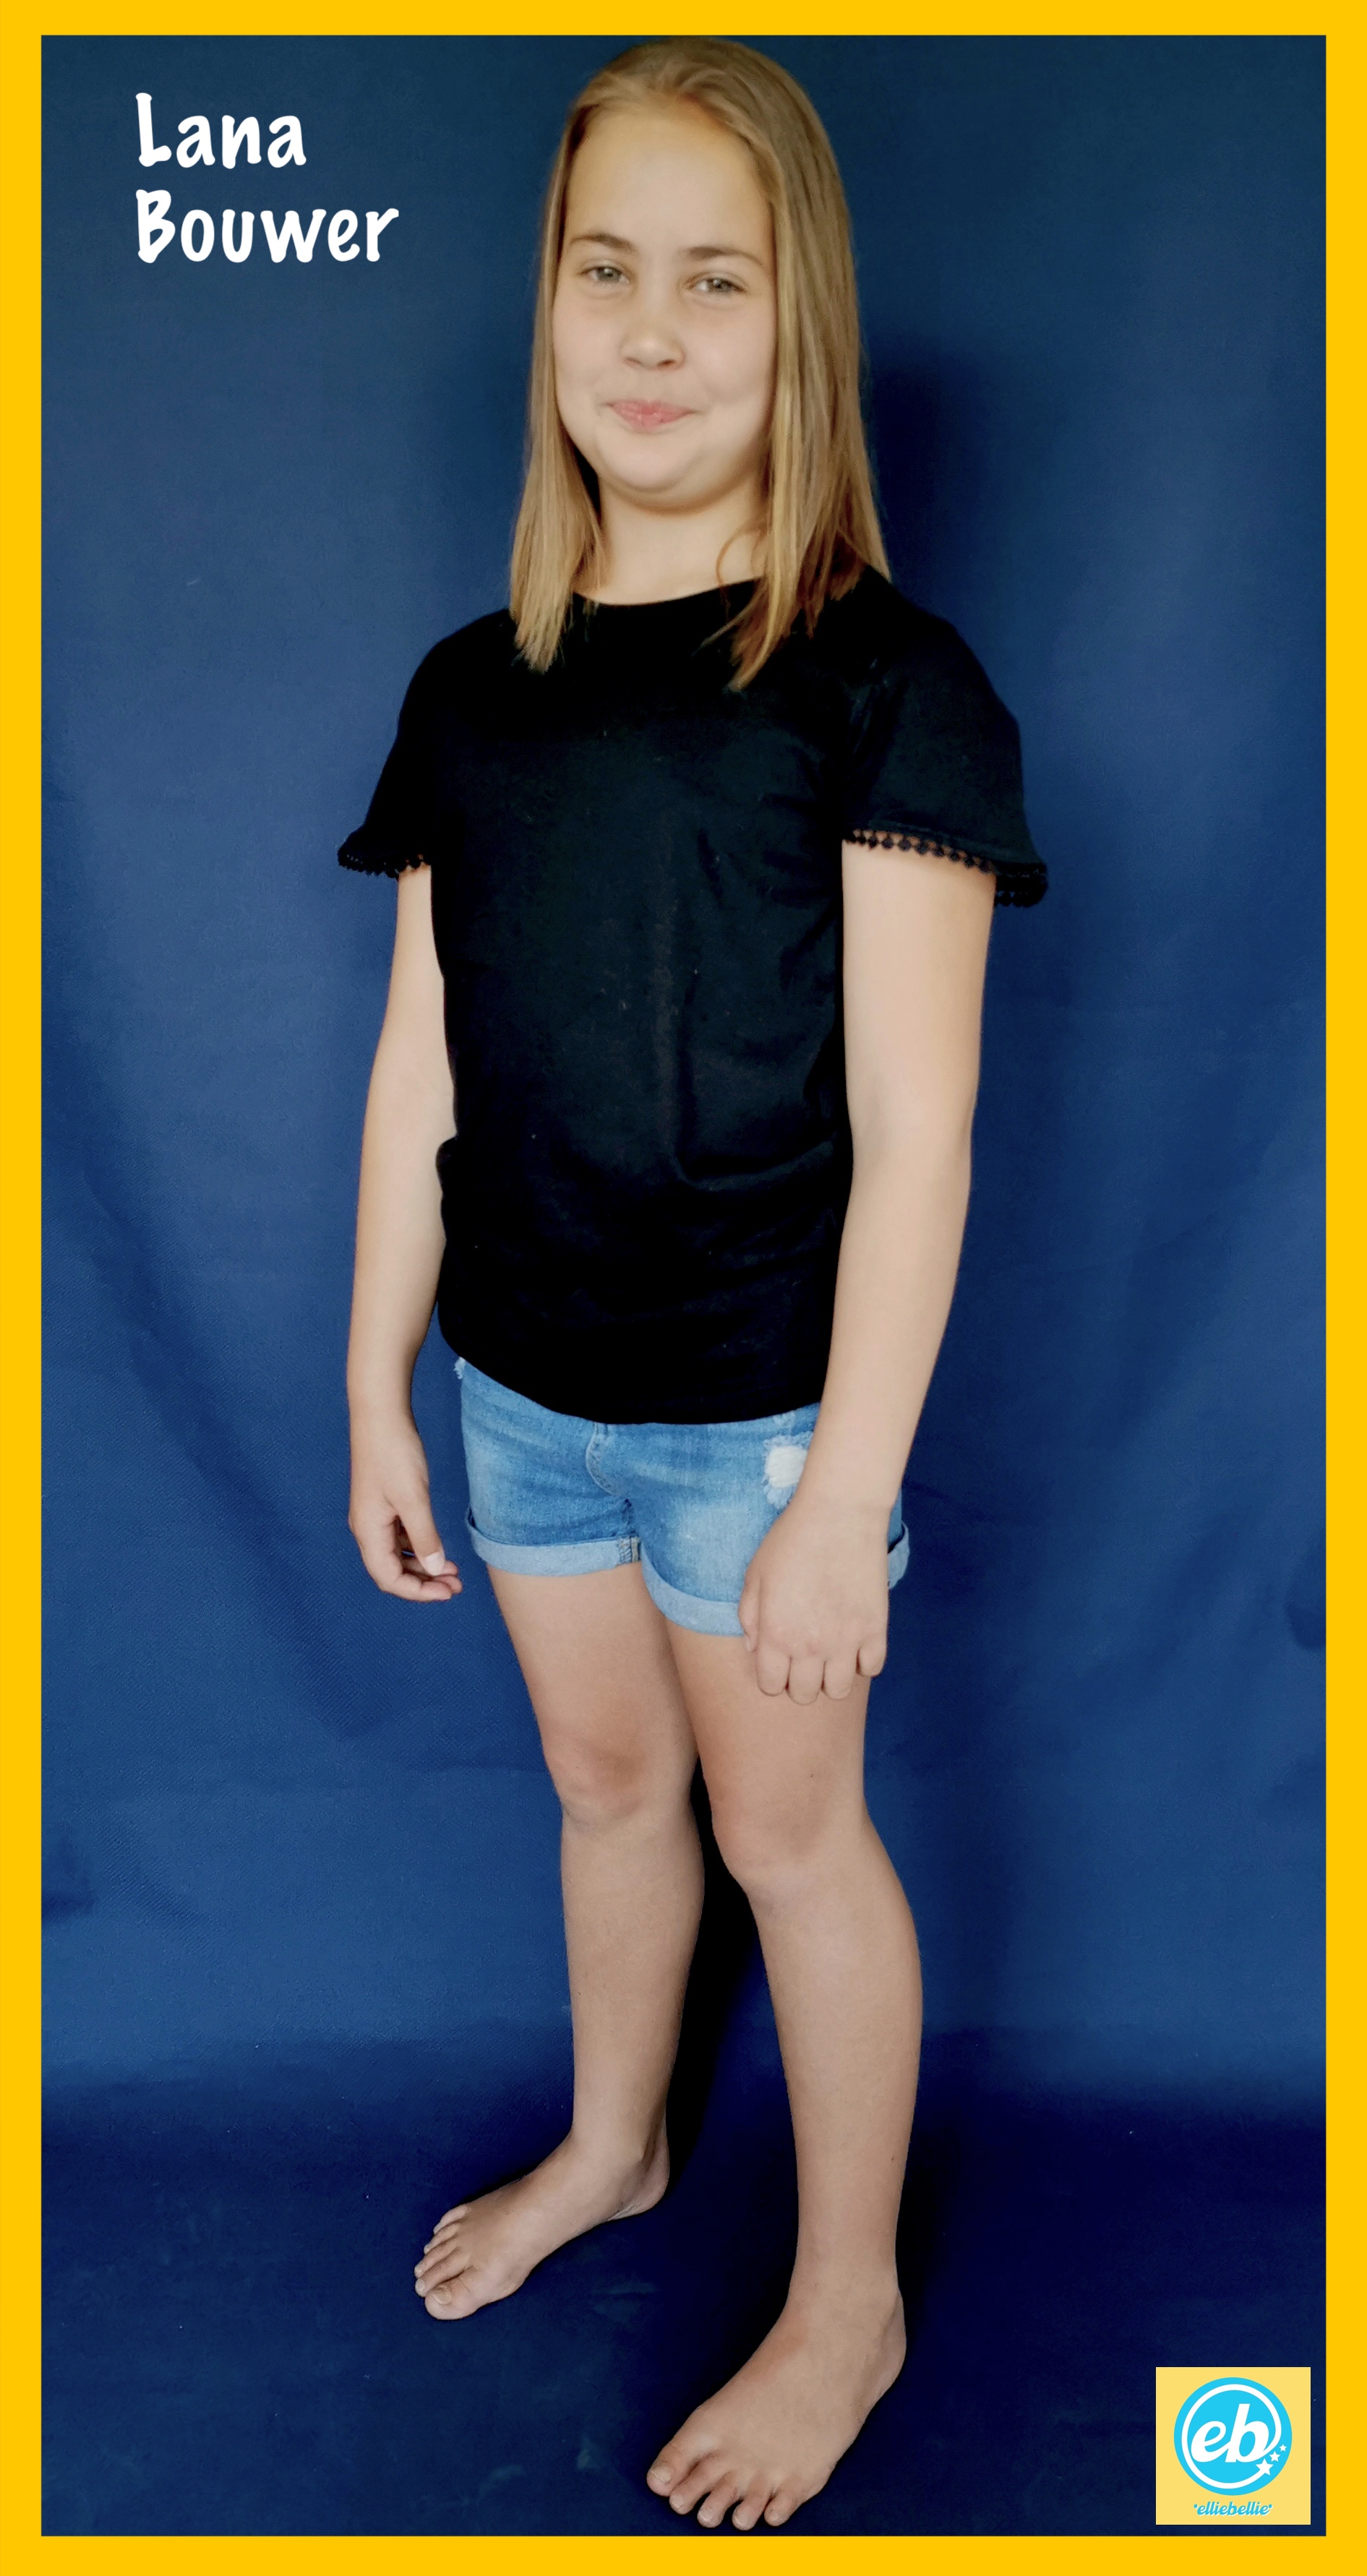 Lana Bouwer